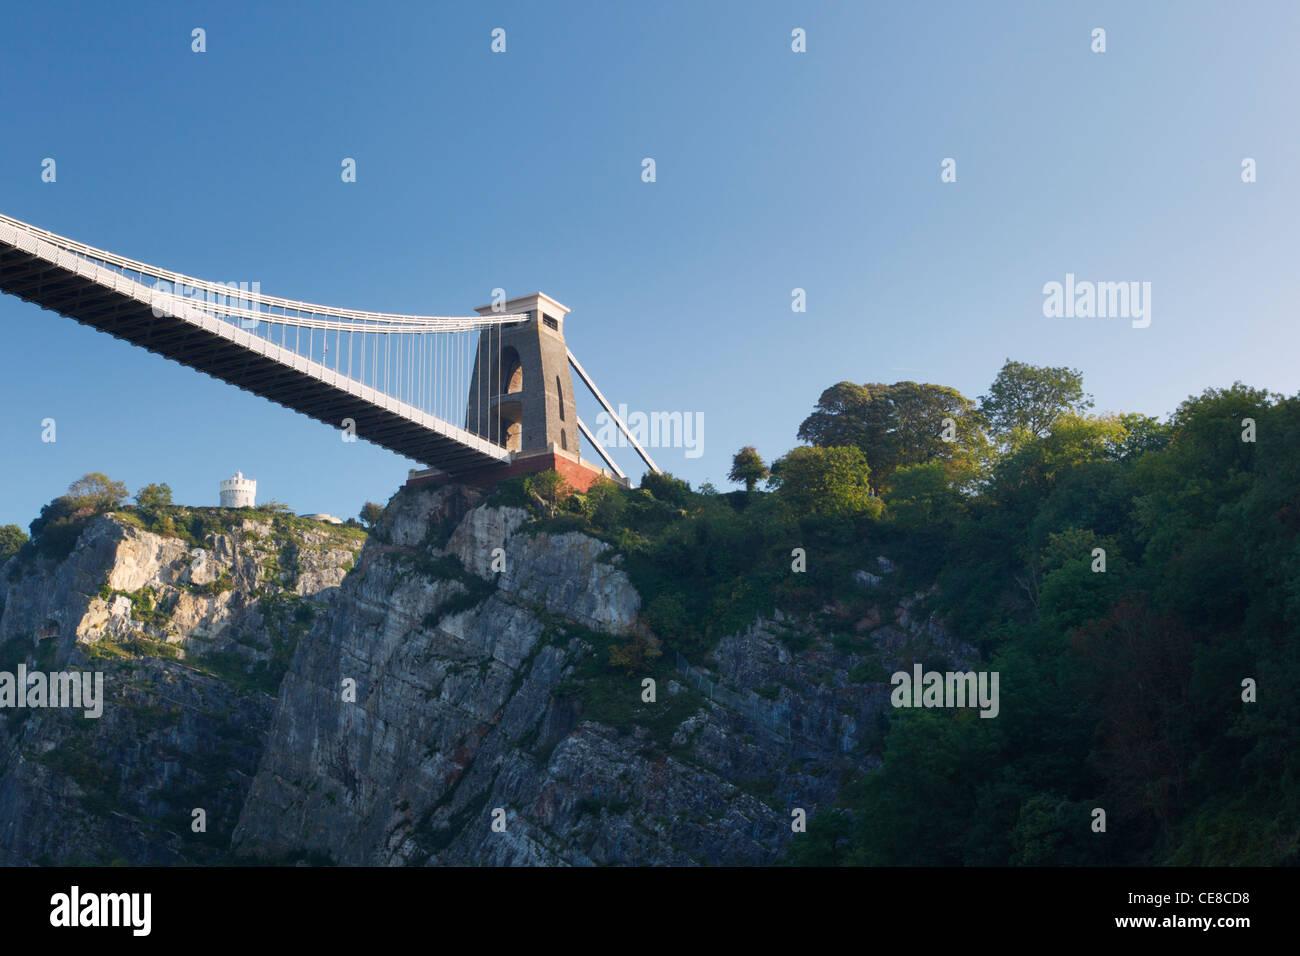 Clifton Suspension Bridge enjambant l'Avon Gorge. Bristol. L'Angleterre. UK. Banque D'Images